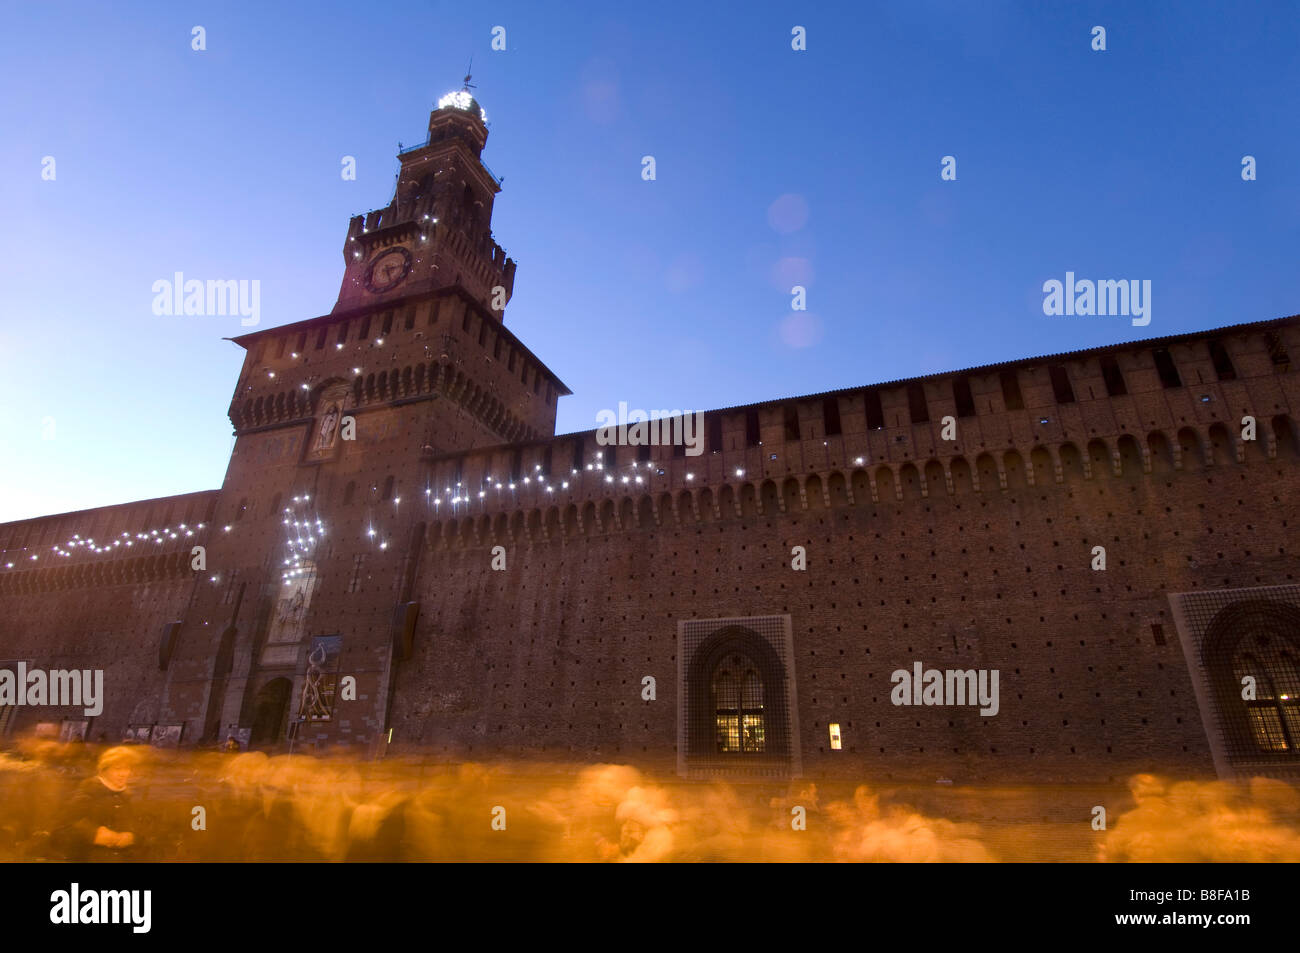 Castello Sforzesco Milan Italy with light installation - Stock Image